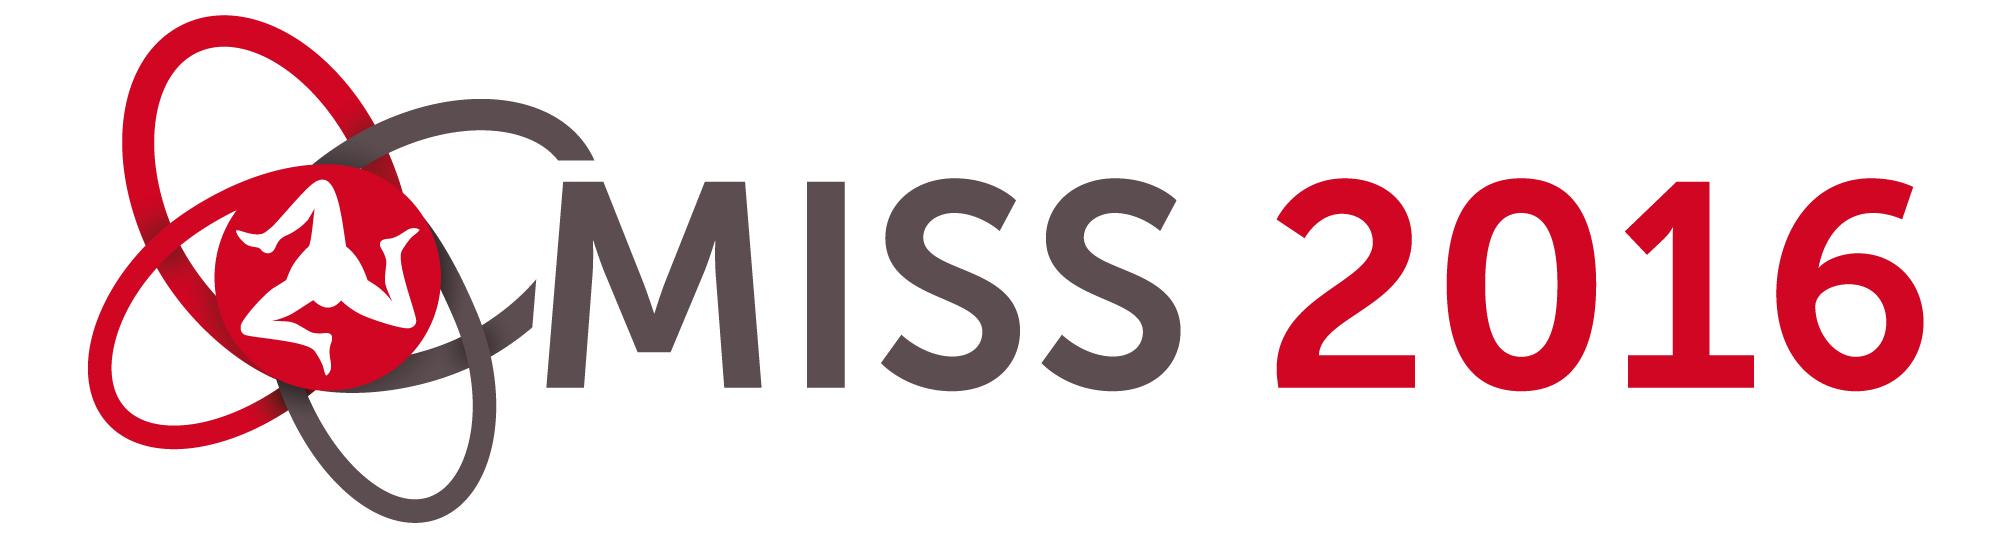 MISS2016